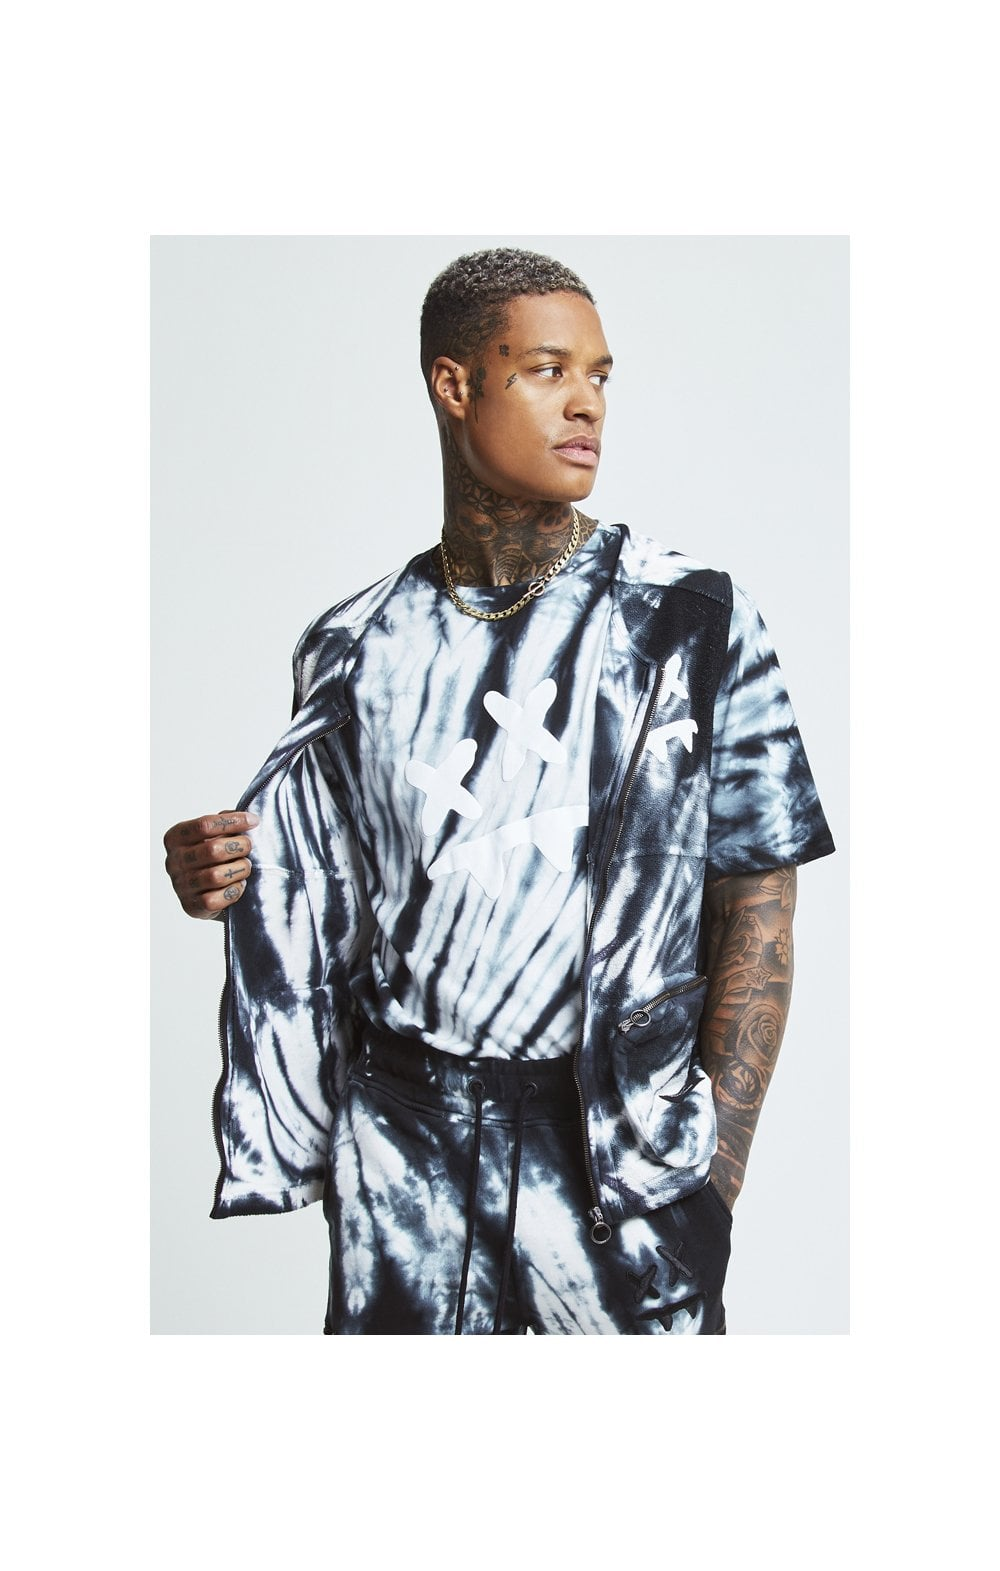 SikSilk X Steve Aoki Utility Vest - Black & White Ink Tie Dye MEN SIZES TOP: Extra Large